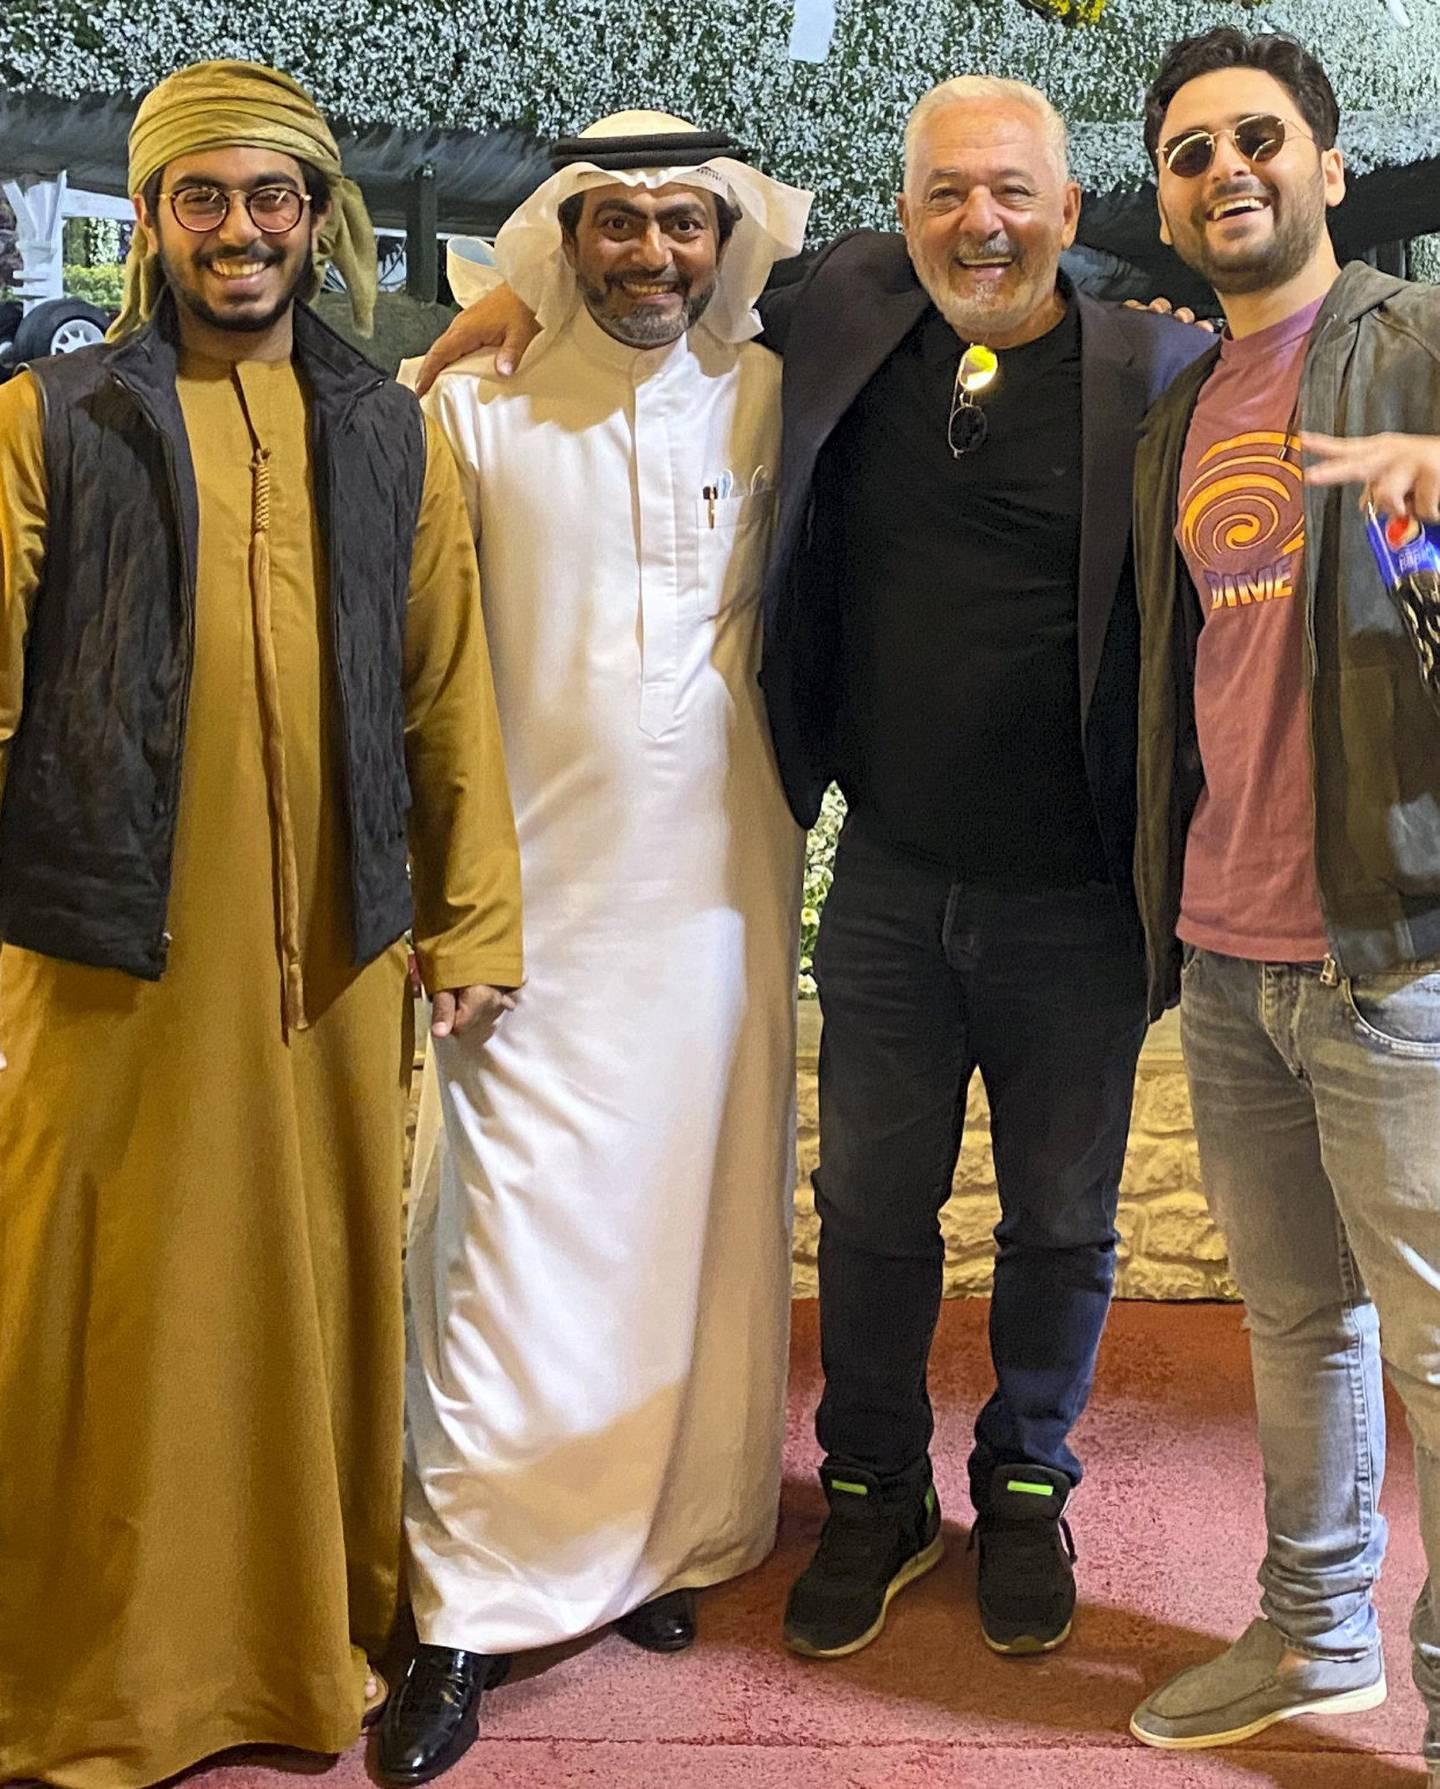 Emirati Mansoor Al Marzooqi (extreme left) with his father Mohamed Al Marzooqi with Israeli businessman Patrick Assuline and his son Dimitri when the family got together in Dubai. Courtesy: Al Marzooqi family.